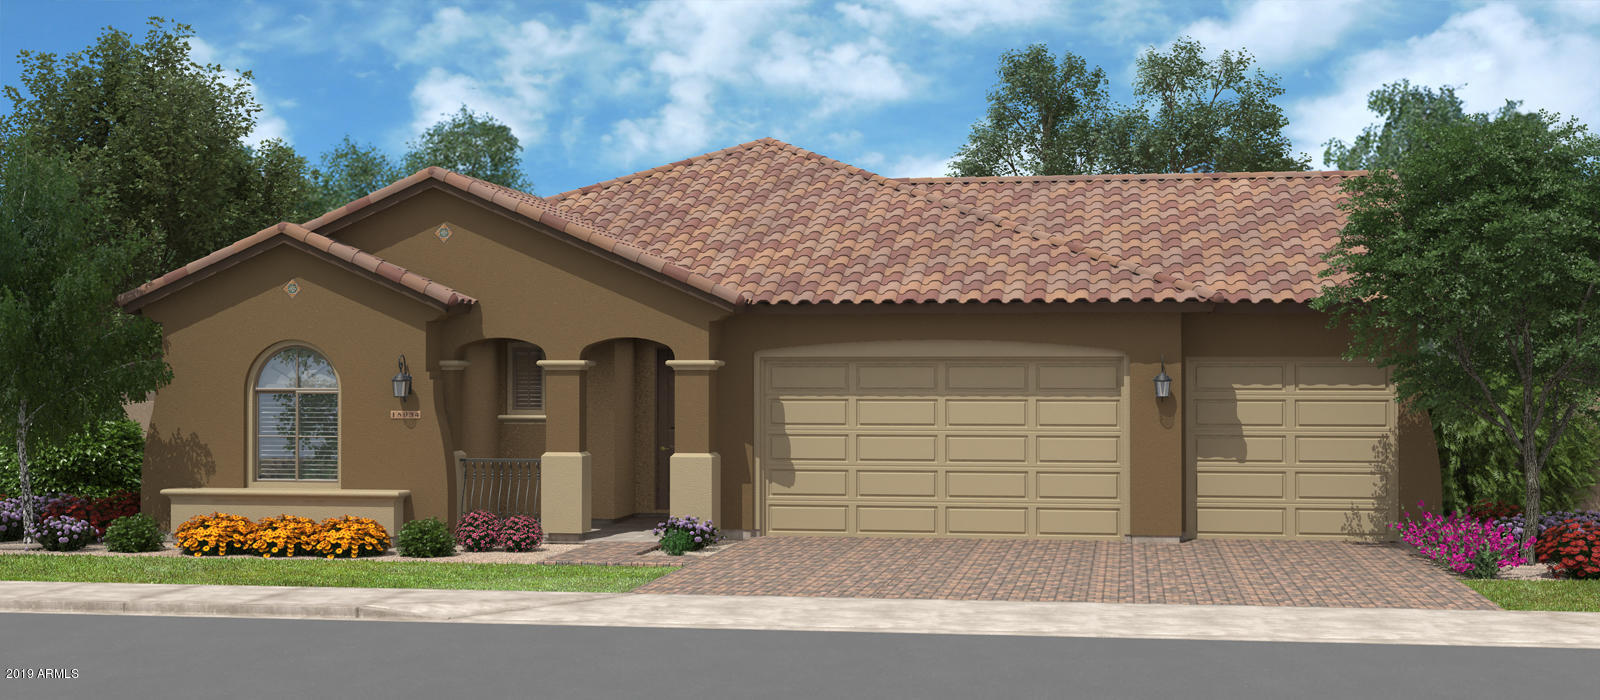 990 W Pagoda Avenue, Queen Creek, AZ 85140, MLS # 5994307 | Better Pagoda House Floor Plan Legacy Homes on